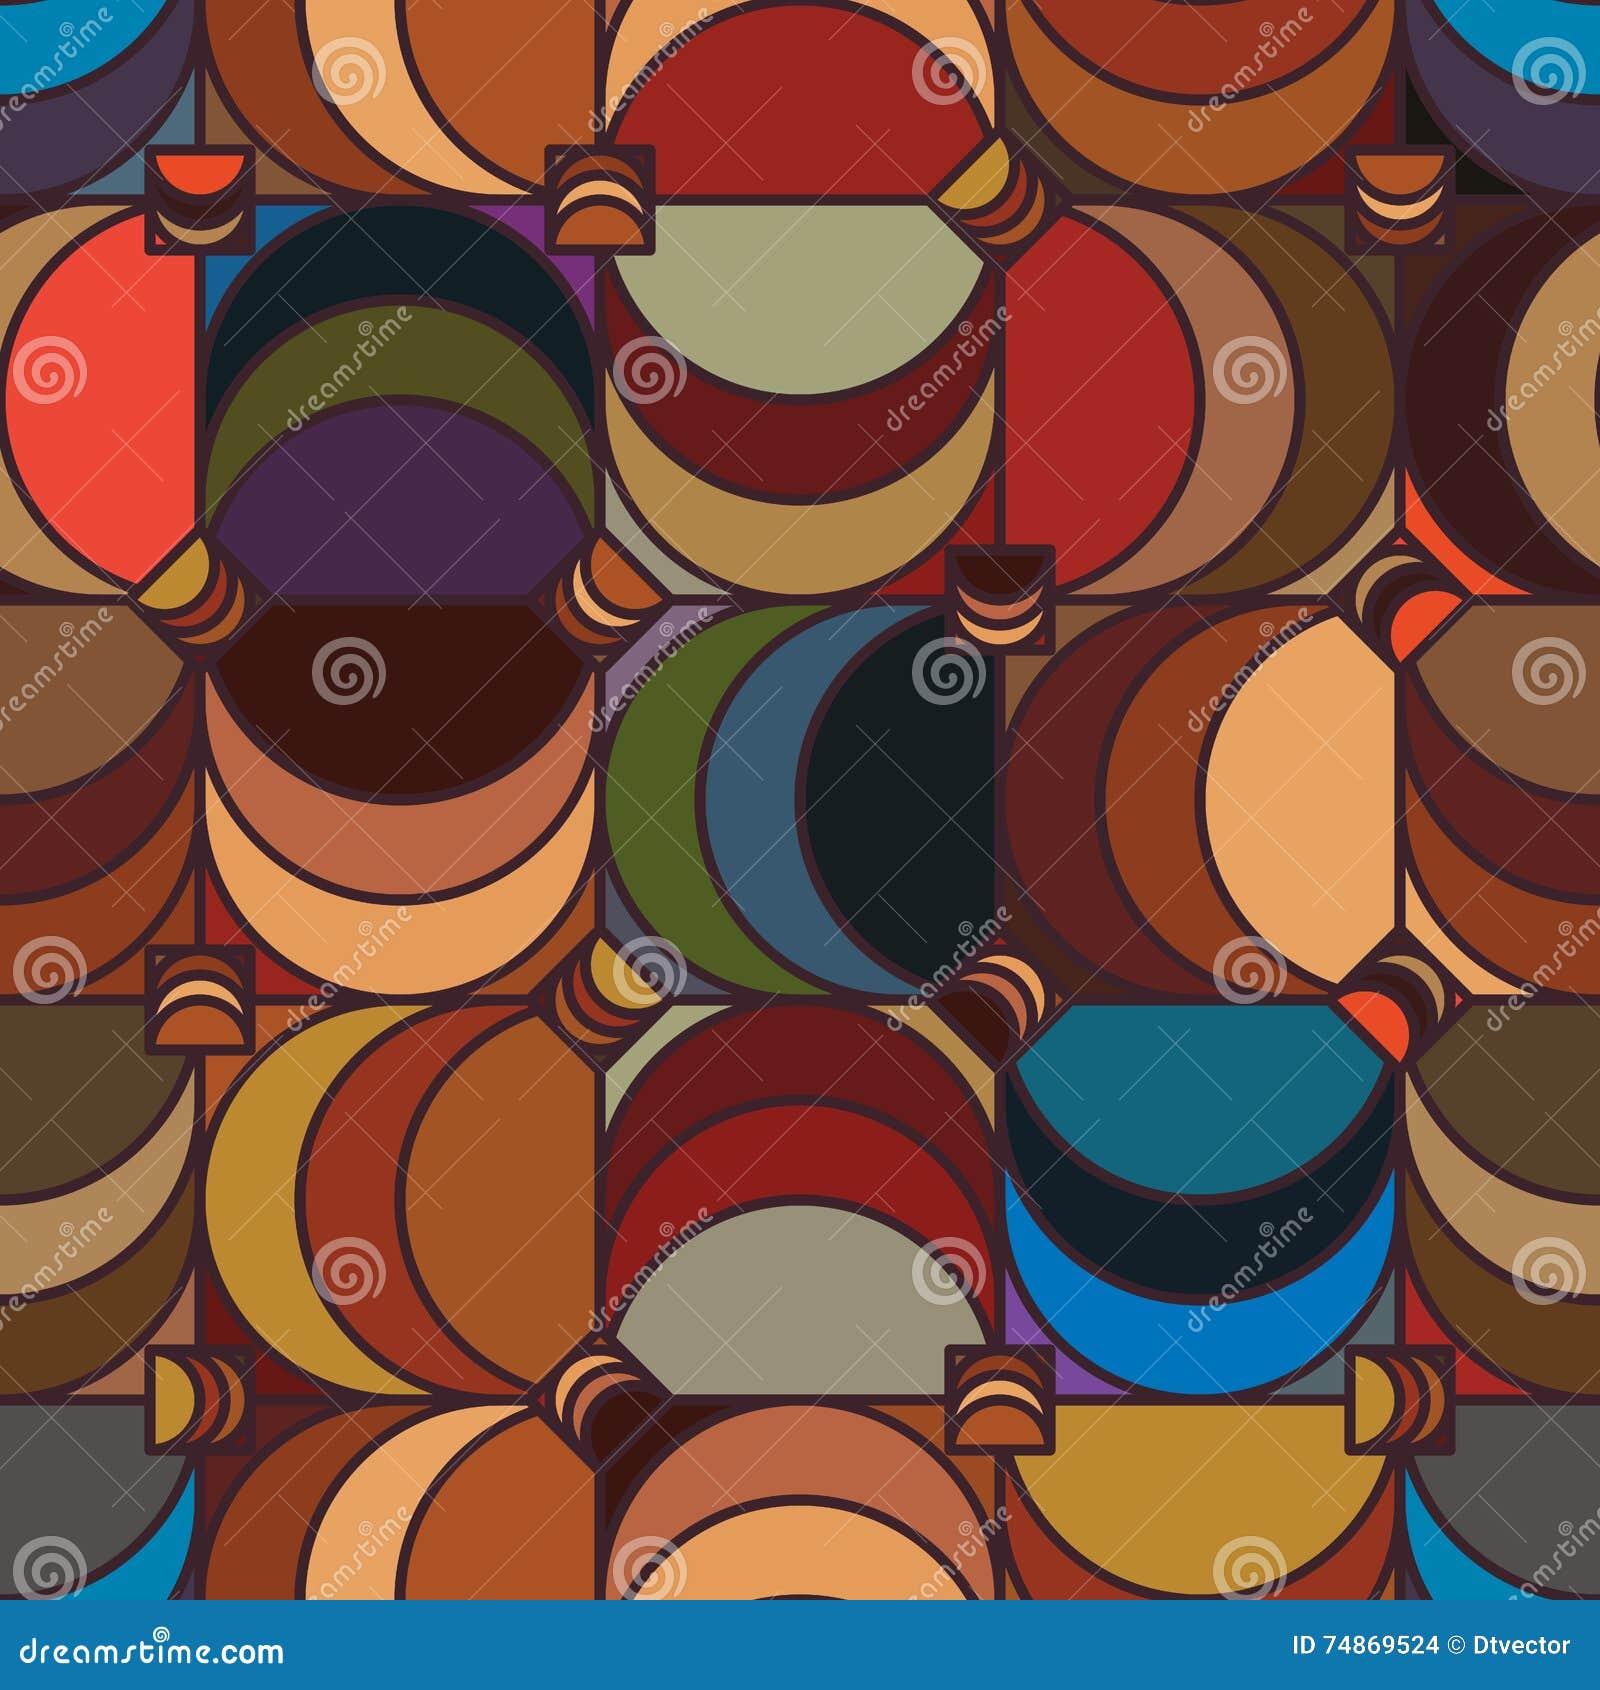 Square half moon vintage seamless pattern